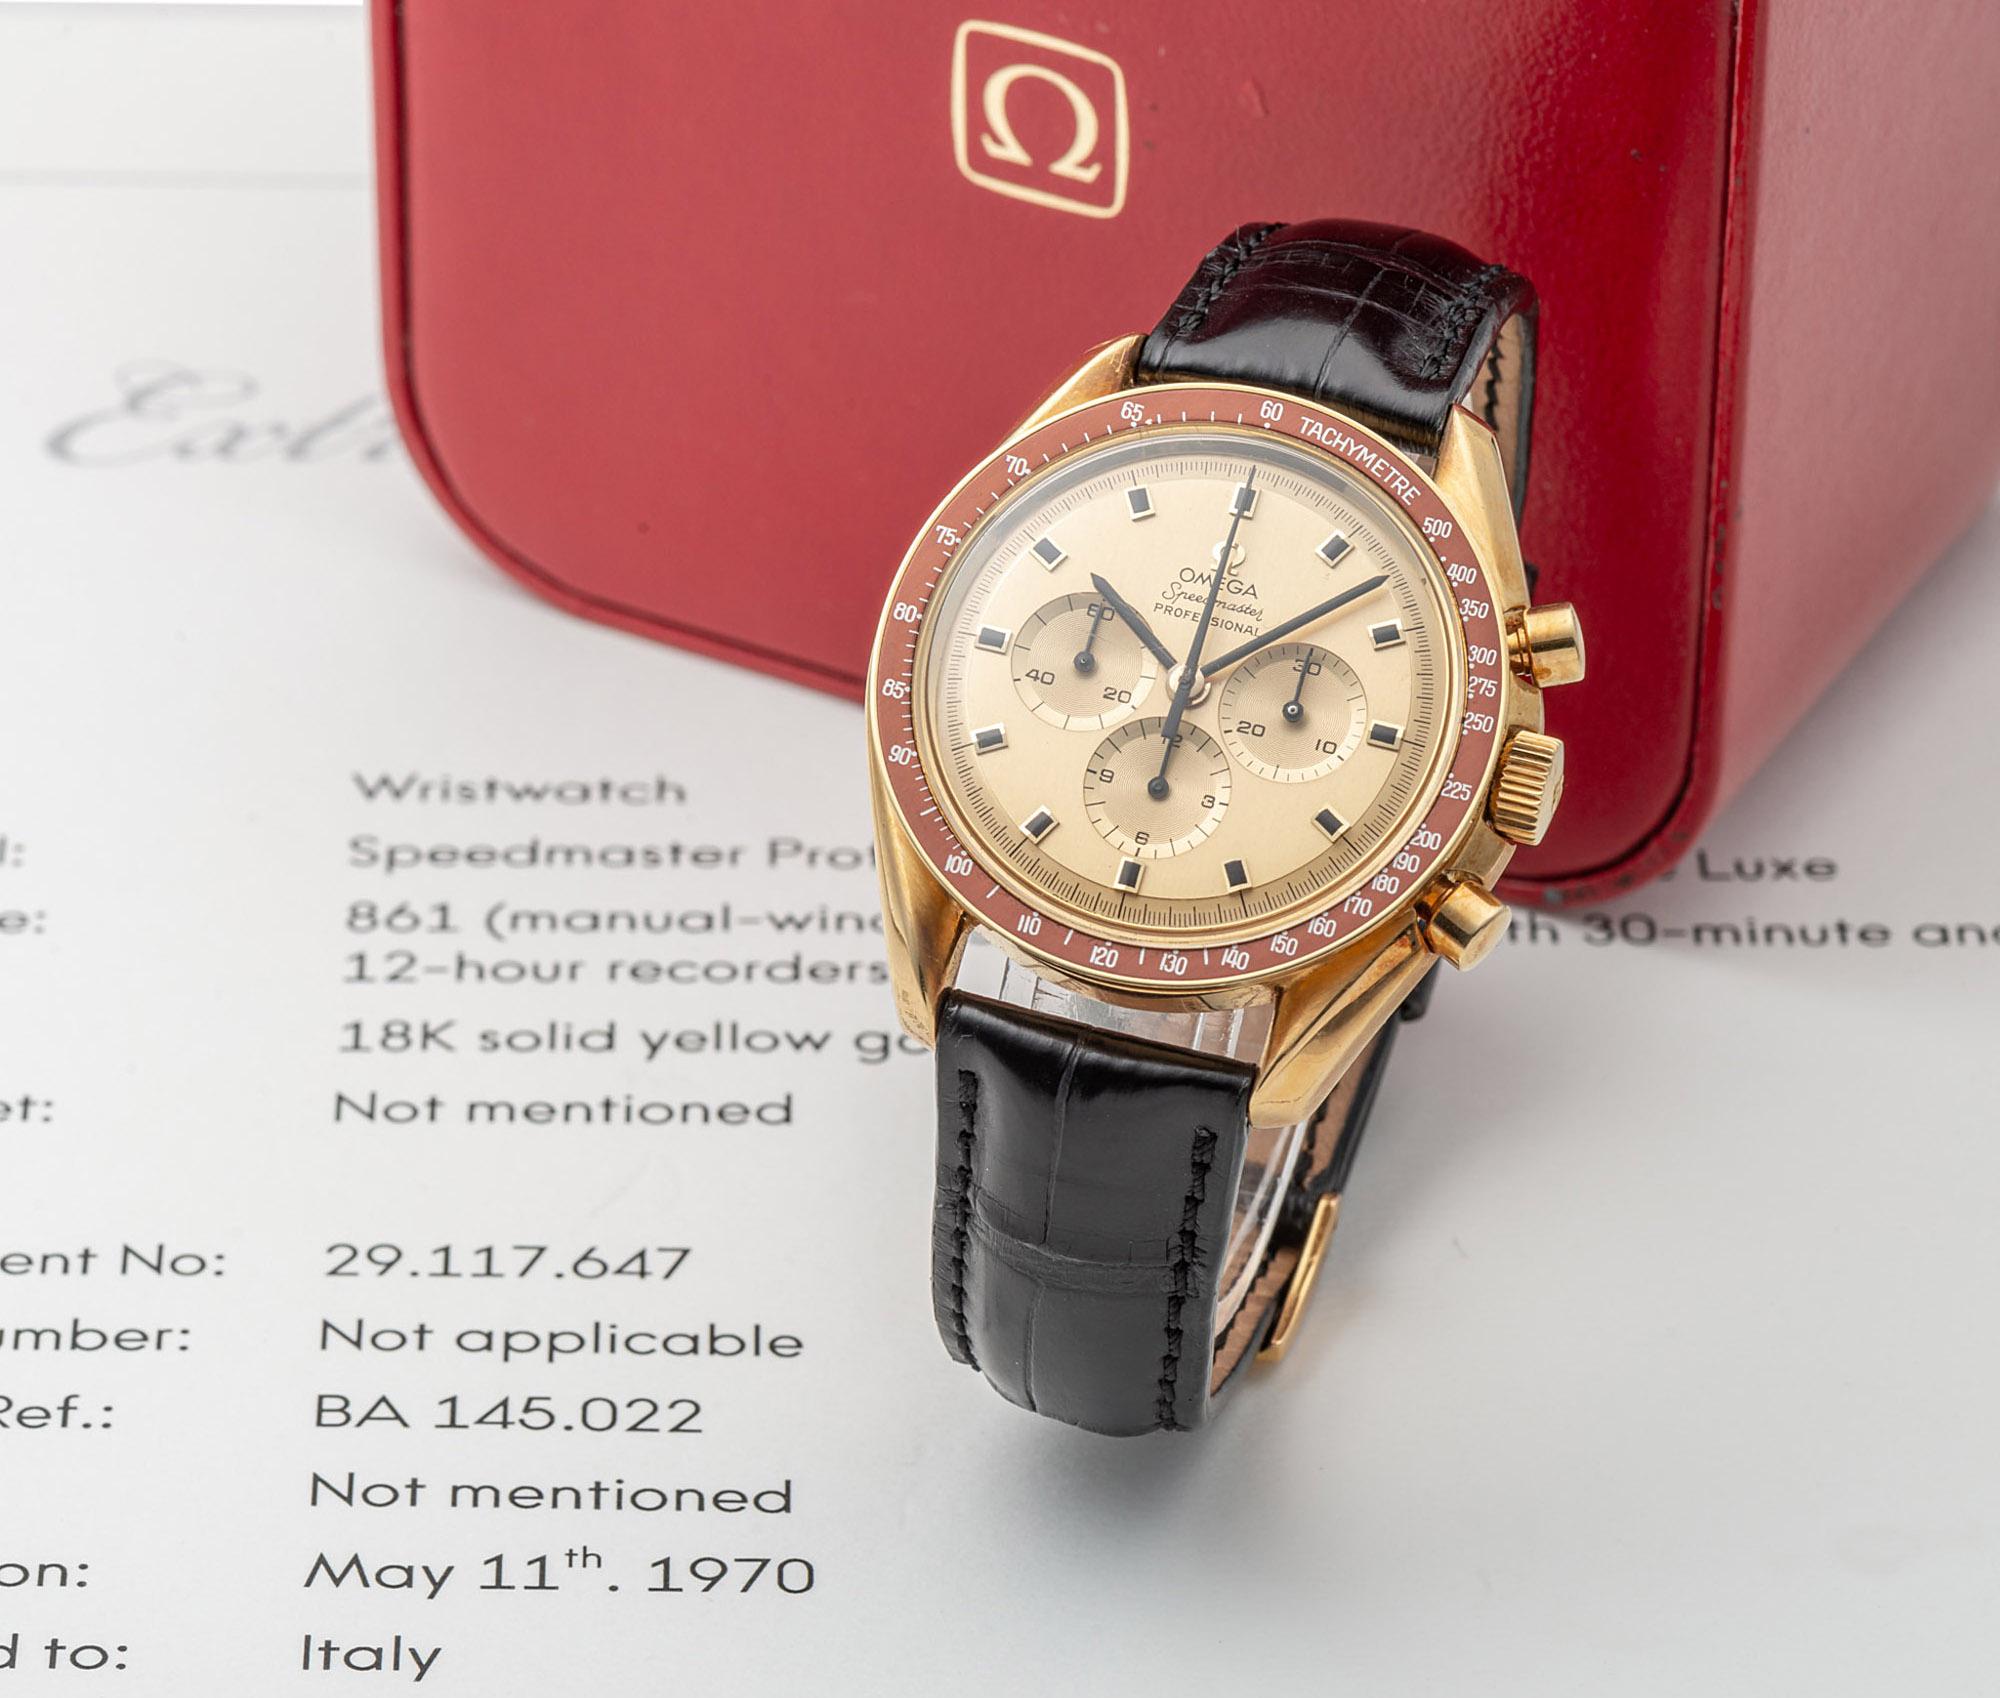 Omega Speedmaster Apollo XI Ref. 145.022-69